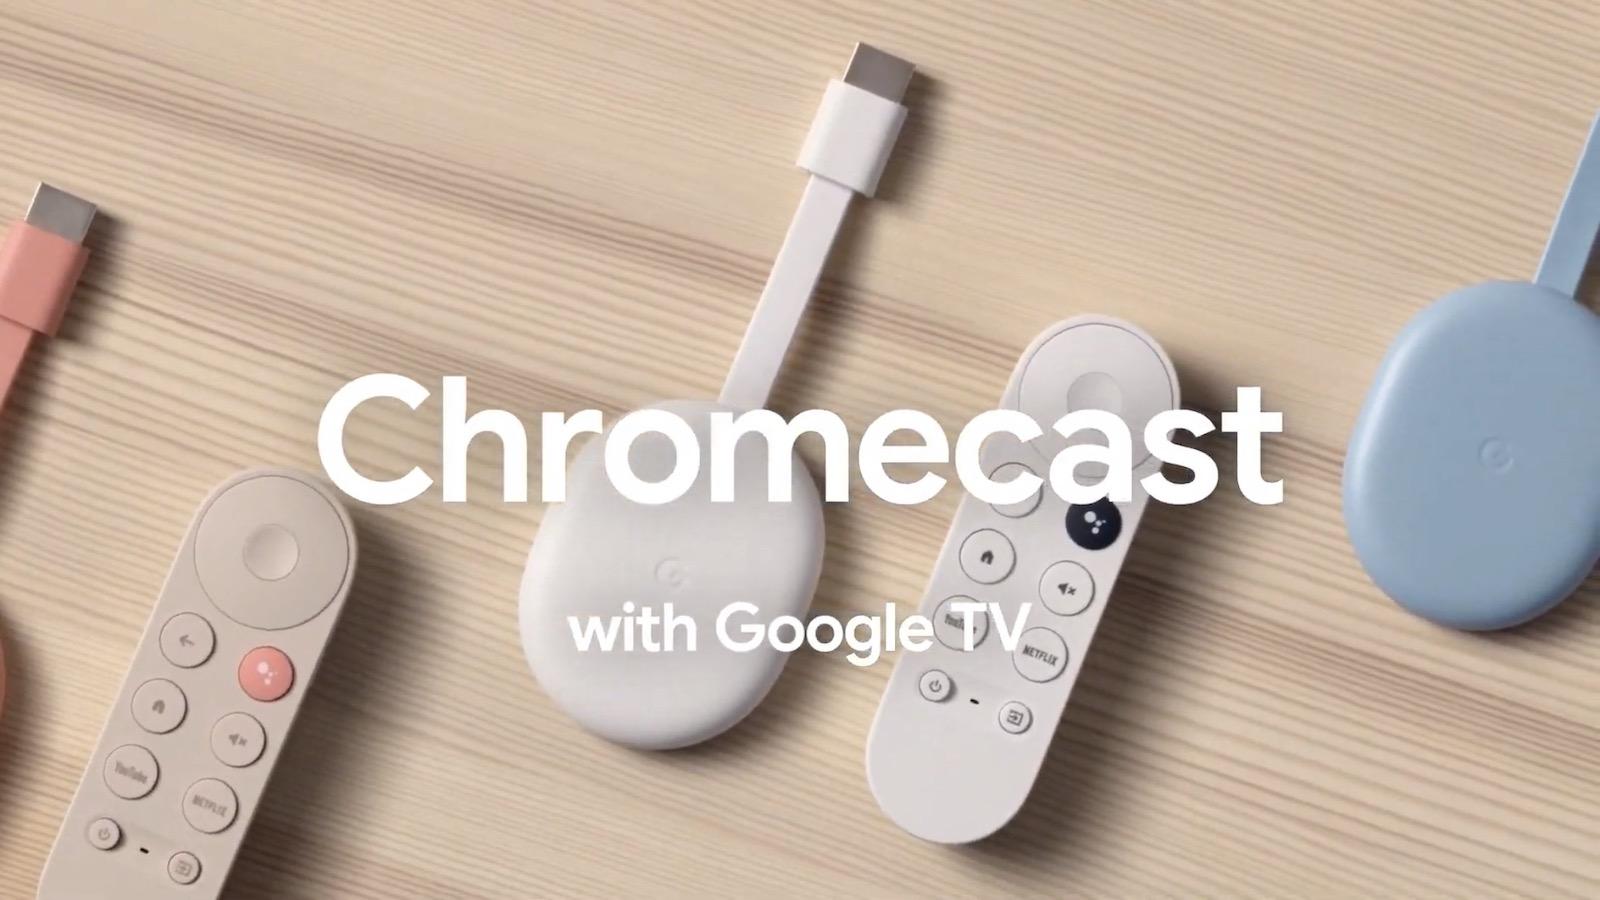 Apple TVアプリ、来年初頭にChromecast with Google TVに対応